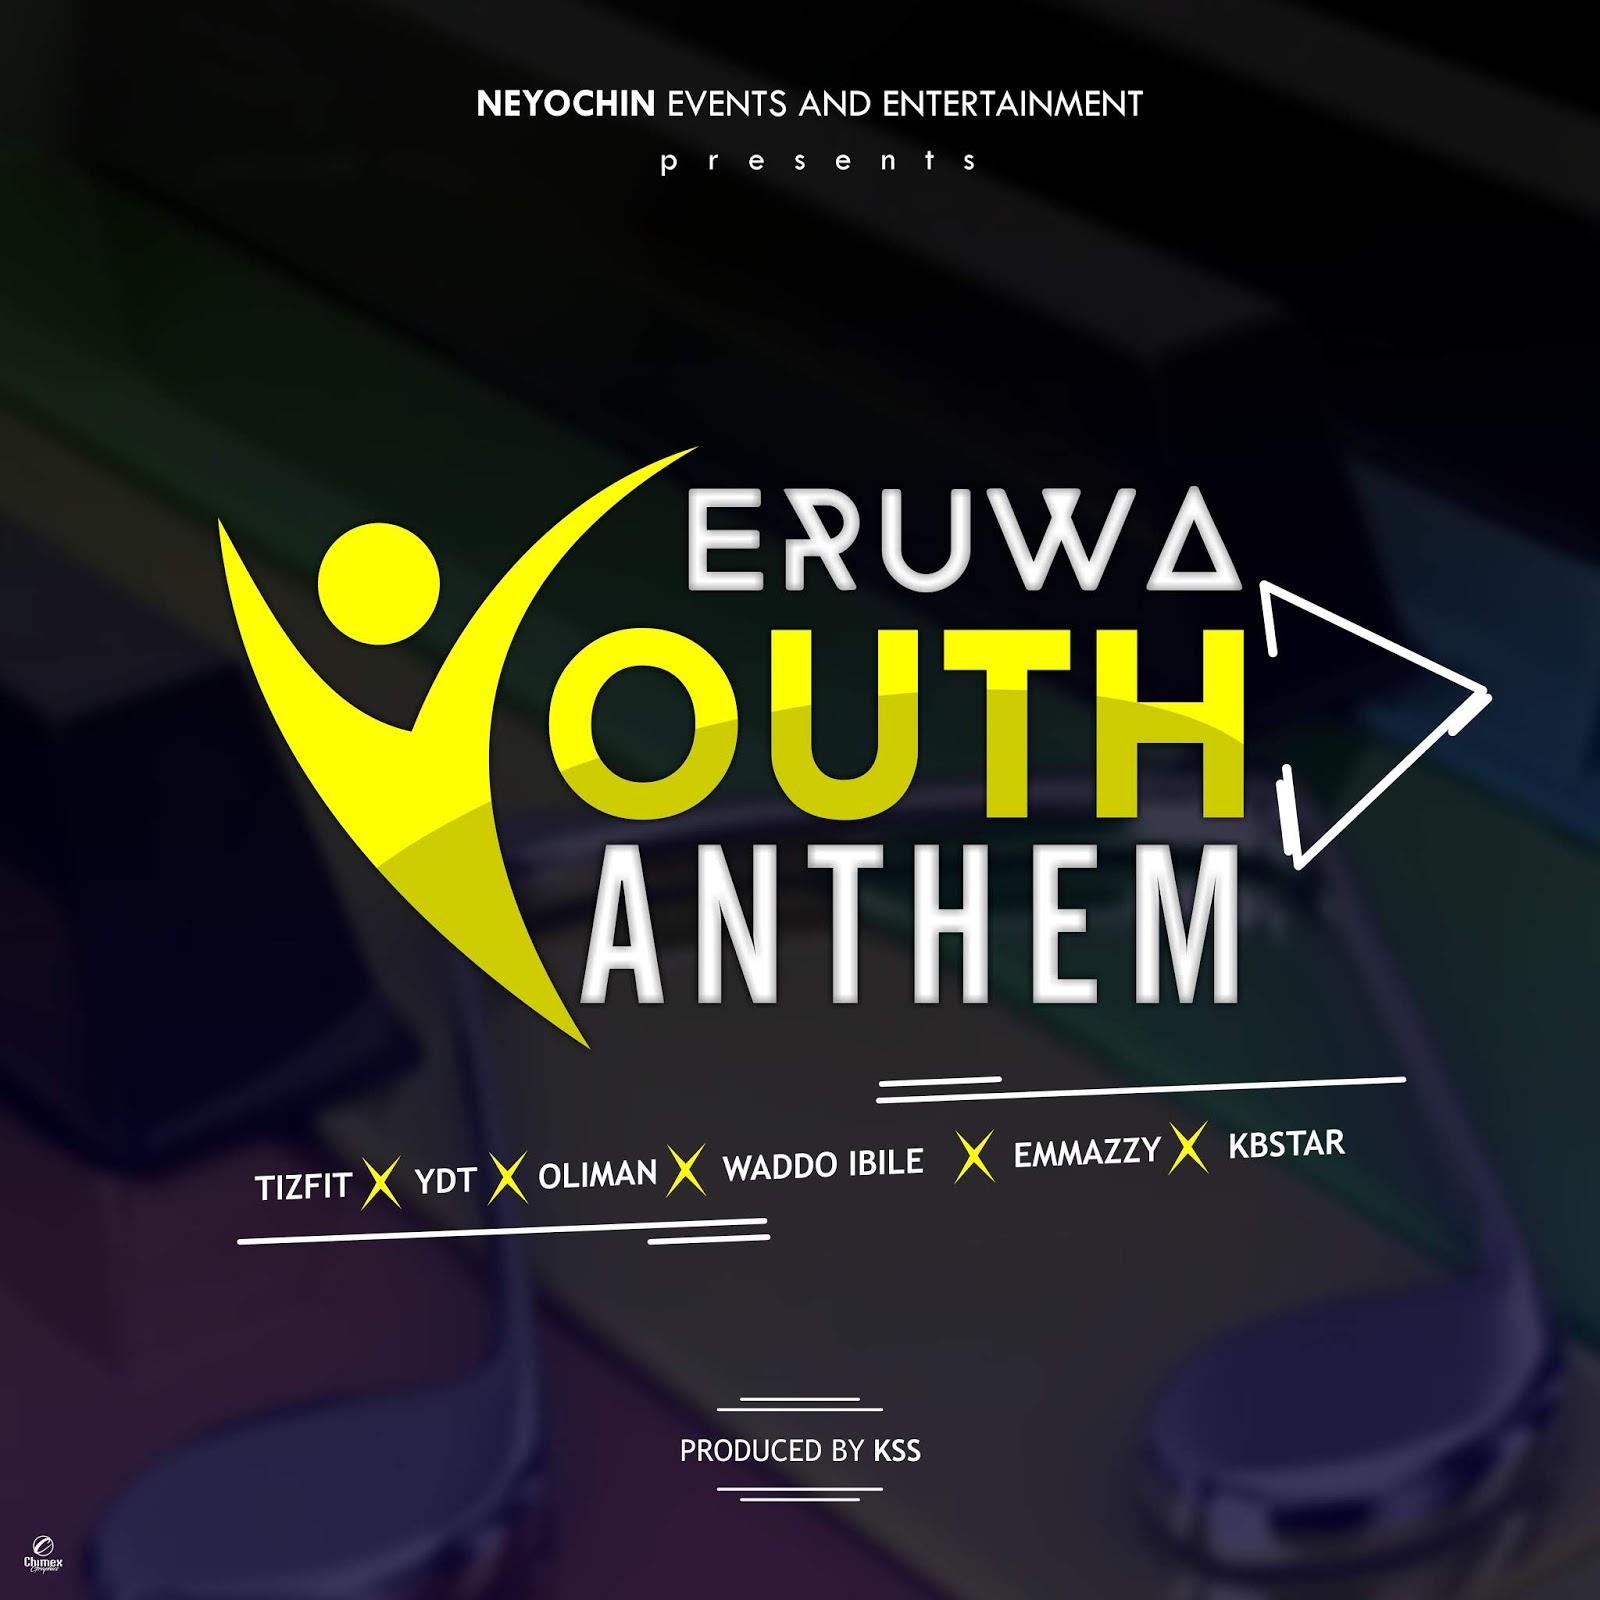 Tizfit YDT Oliman Wadoo Ibile Emmazzy KB Star Eruwa Youth Anthem